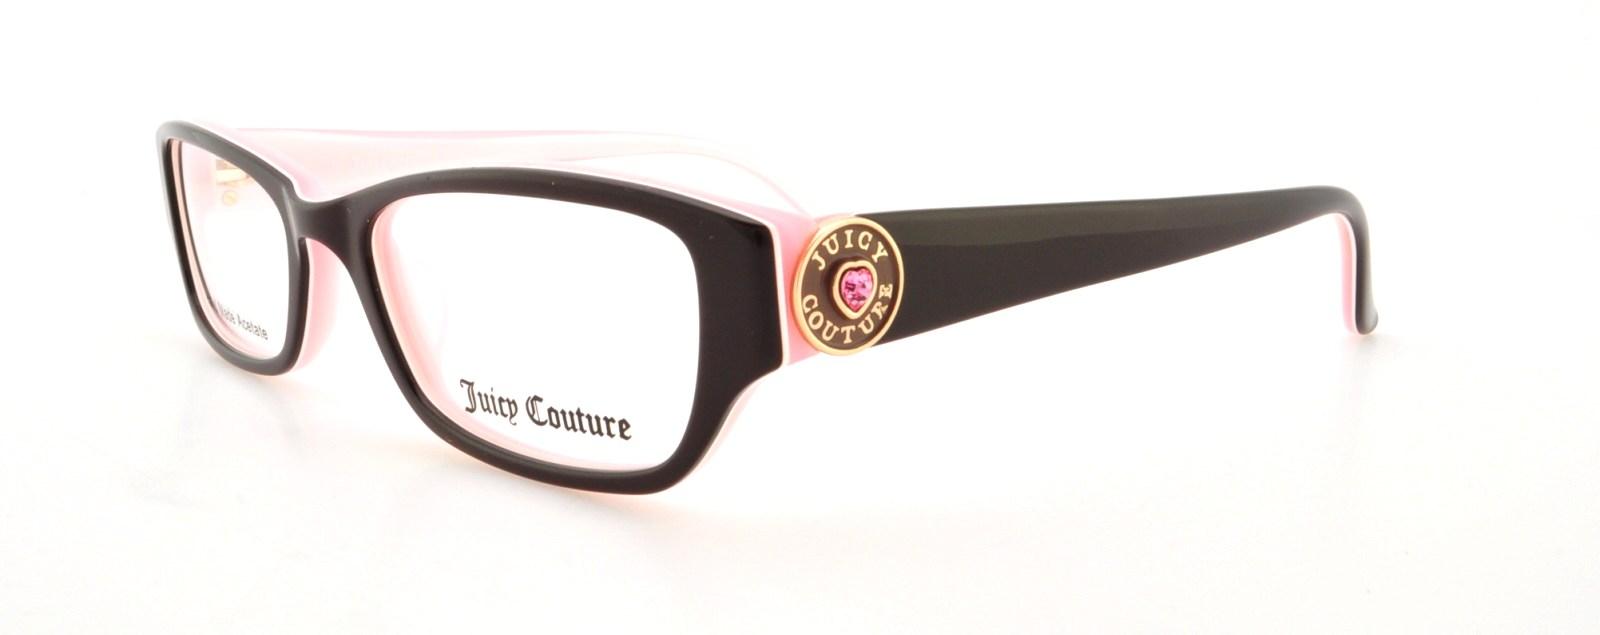 029d175368b Designer Frames Outlet. Juicy Couture 909